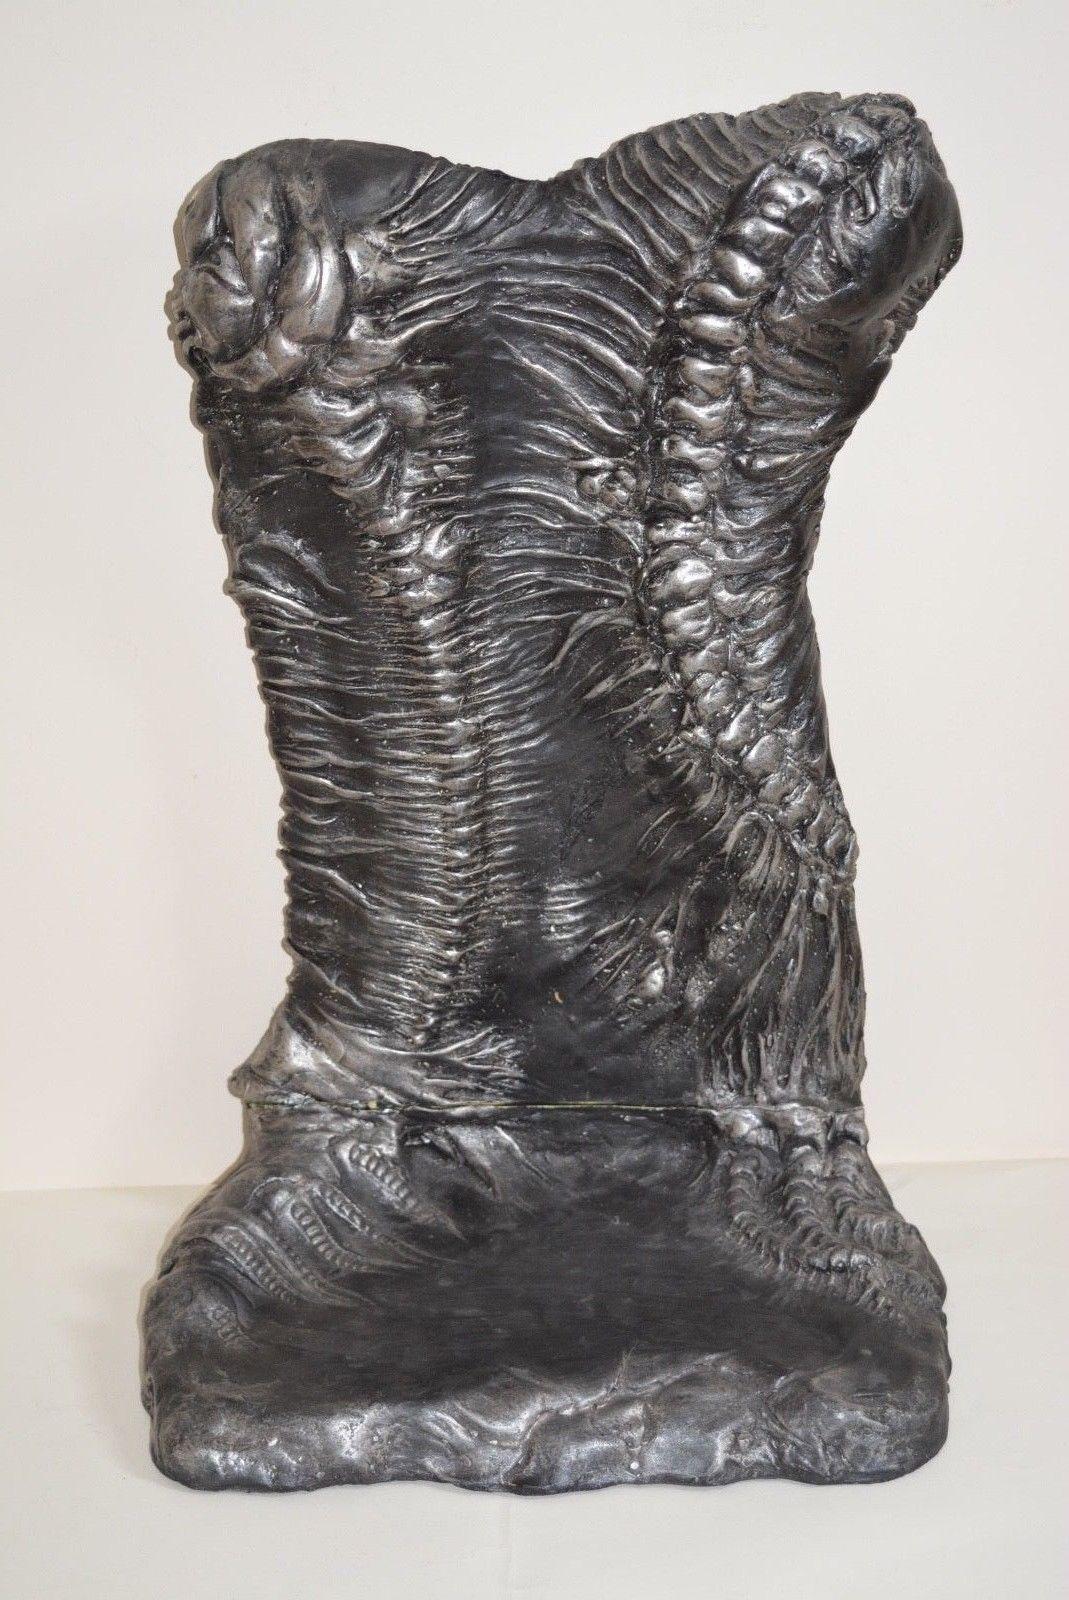 Thomas Kuntz Vintage Art Sculpture Aliens Alien Diorama Base 1 6 Scale Giger